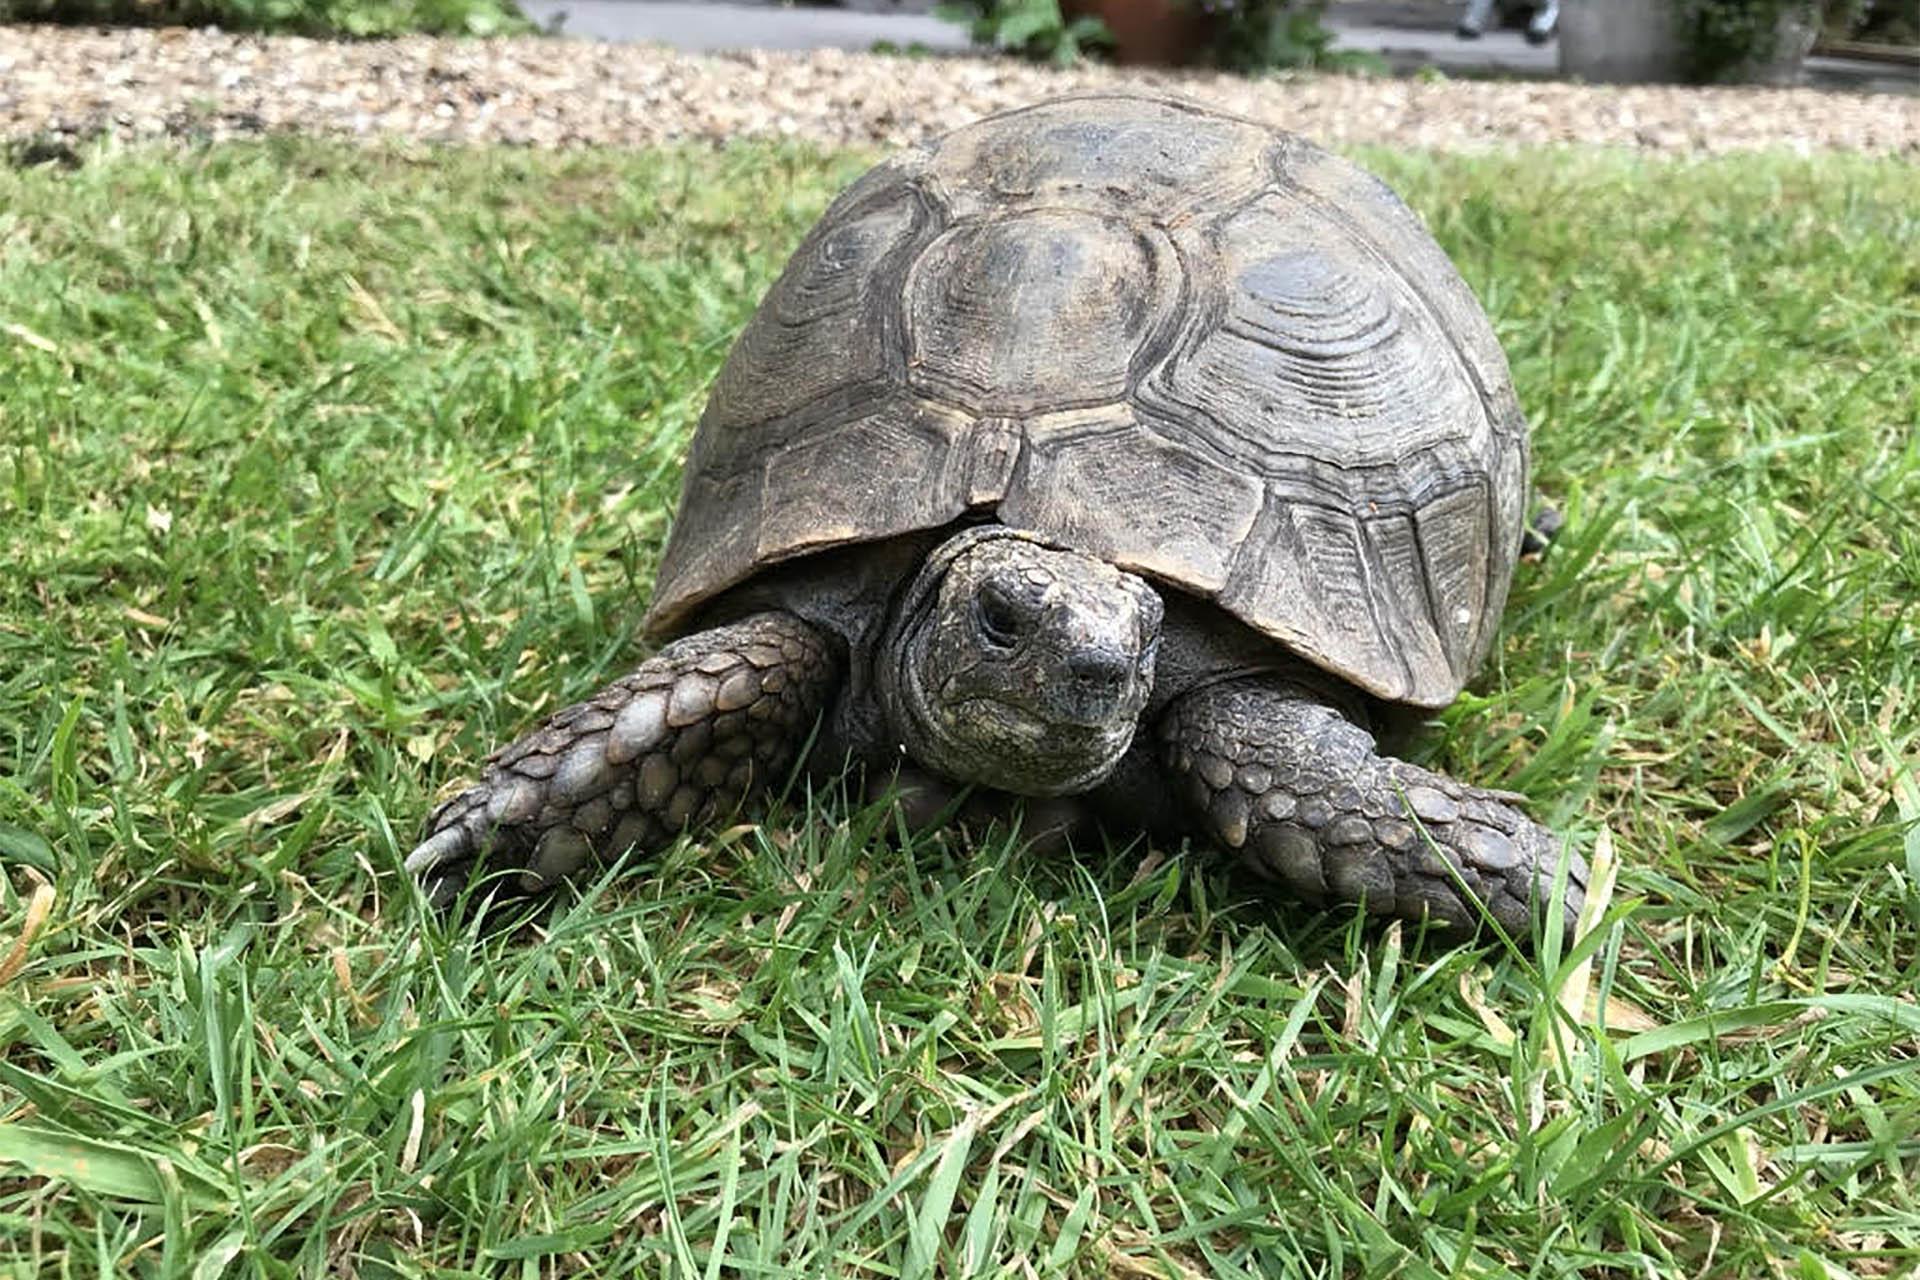 No 8 tortoise